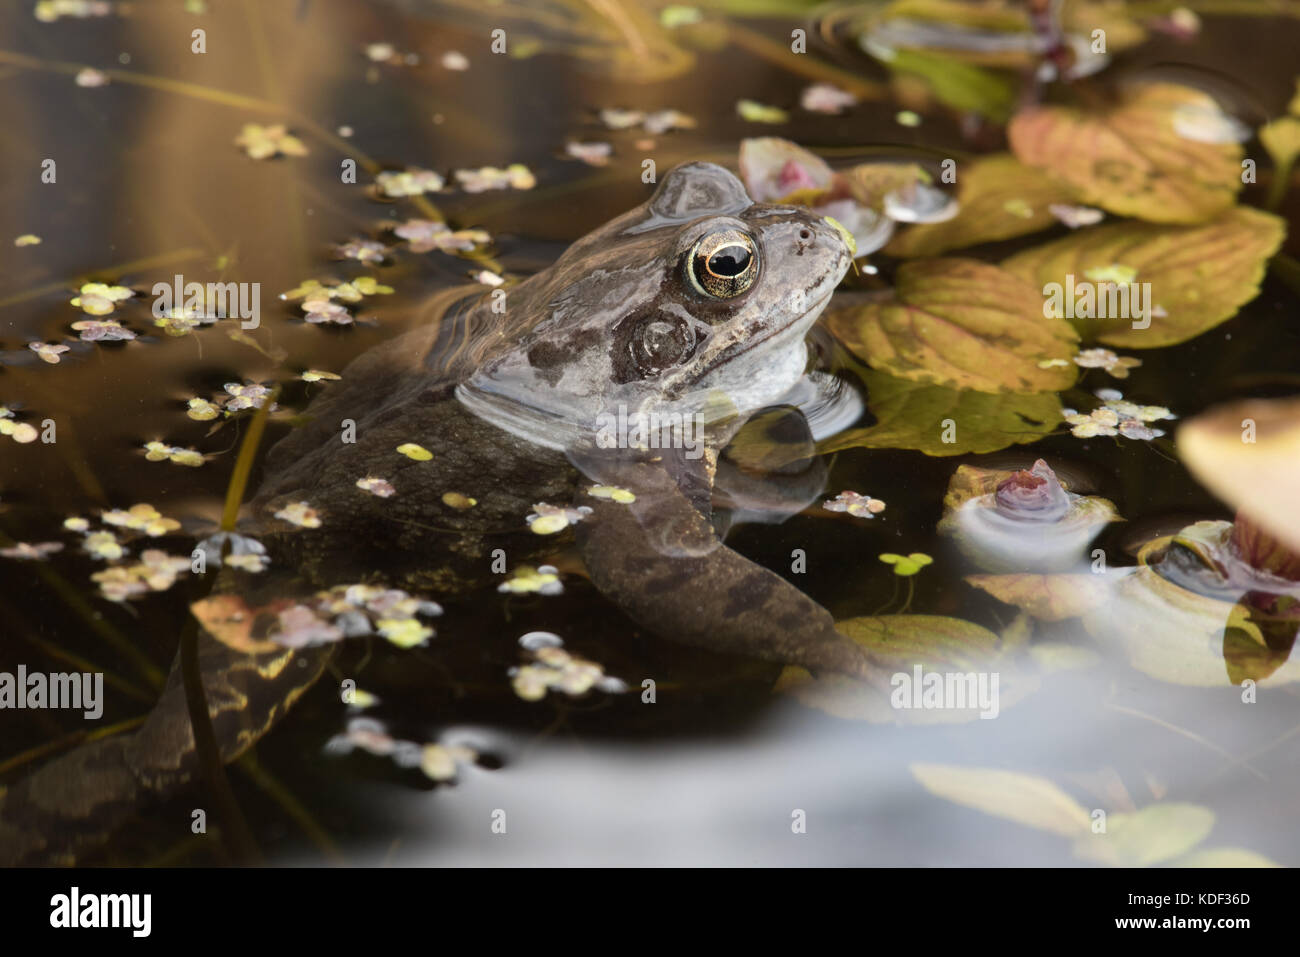 common frog in garden pond - Stock Image